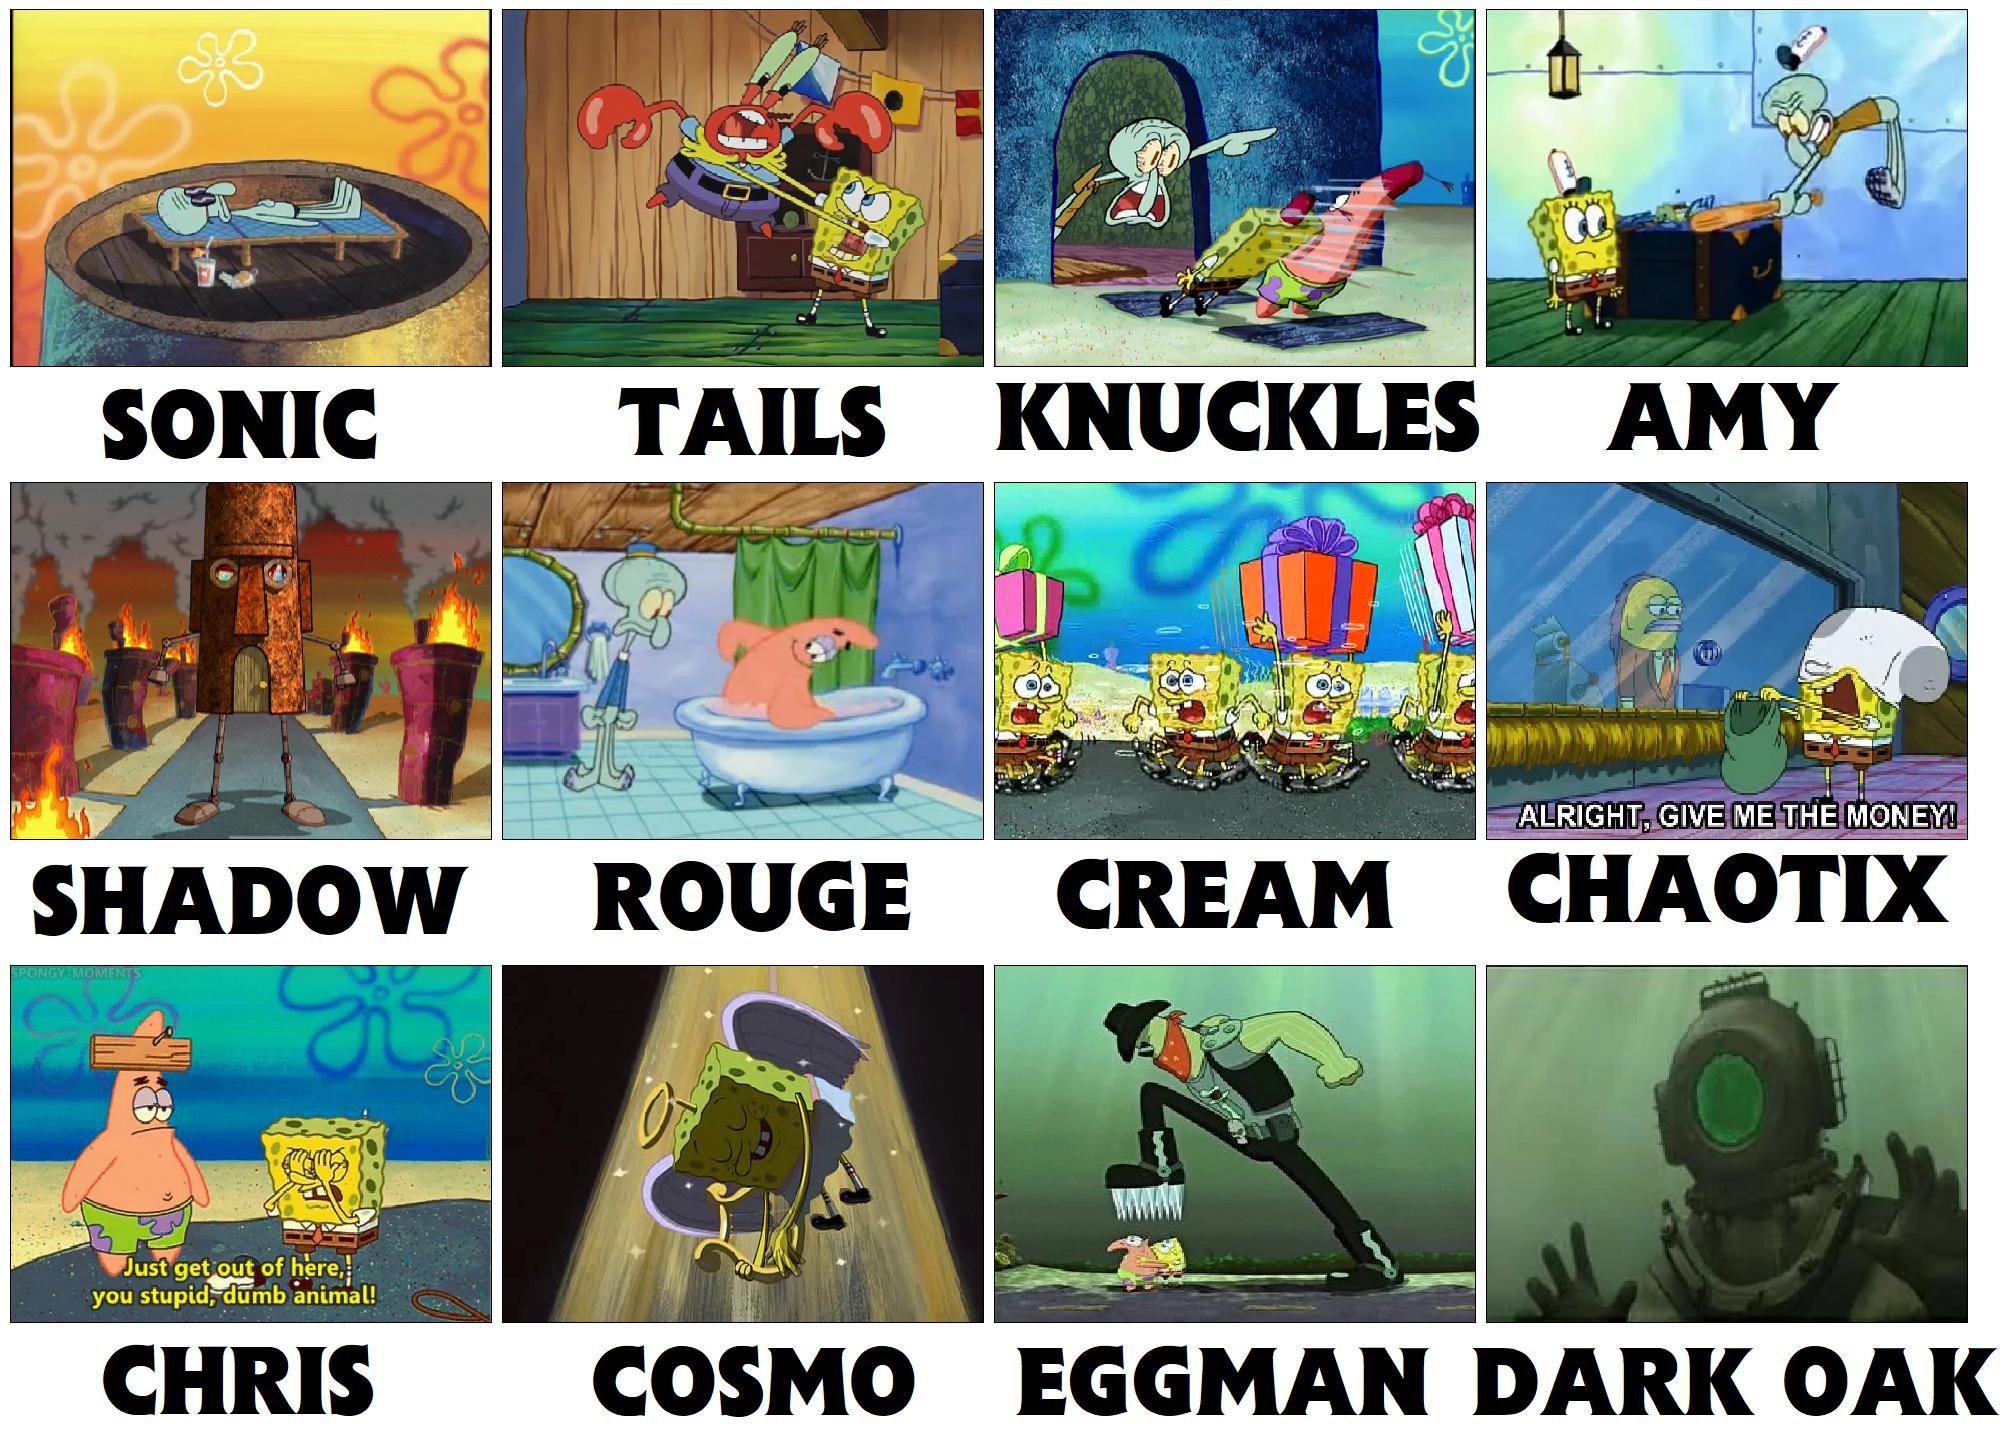 Sonic Xspongebob Comparison Meme Spongebob Spongebob Know Your